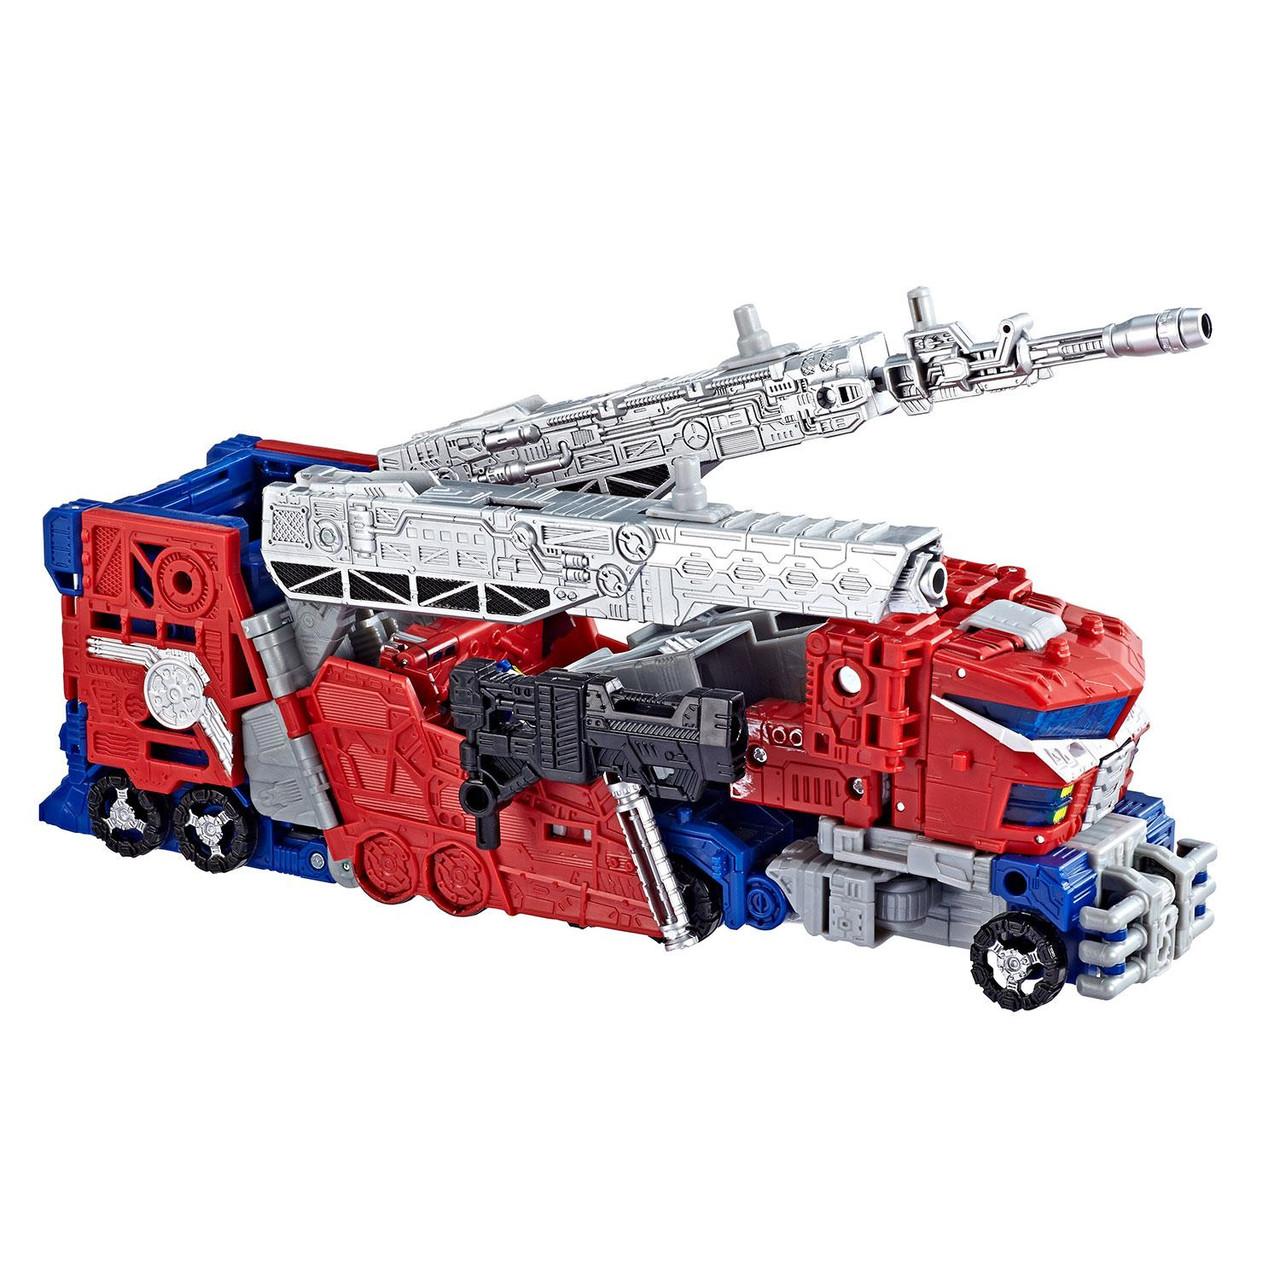 Transformers War for Cybertron Siege Leader Class WFC-S40 Galaxy Optimus Prime